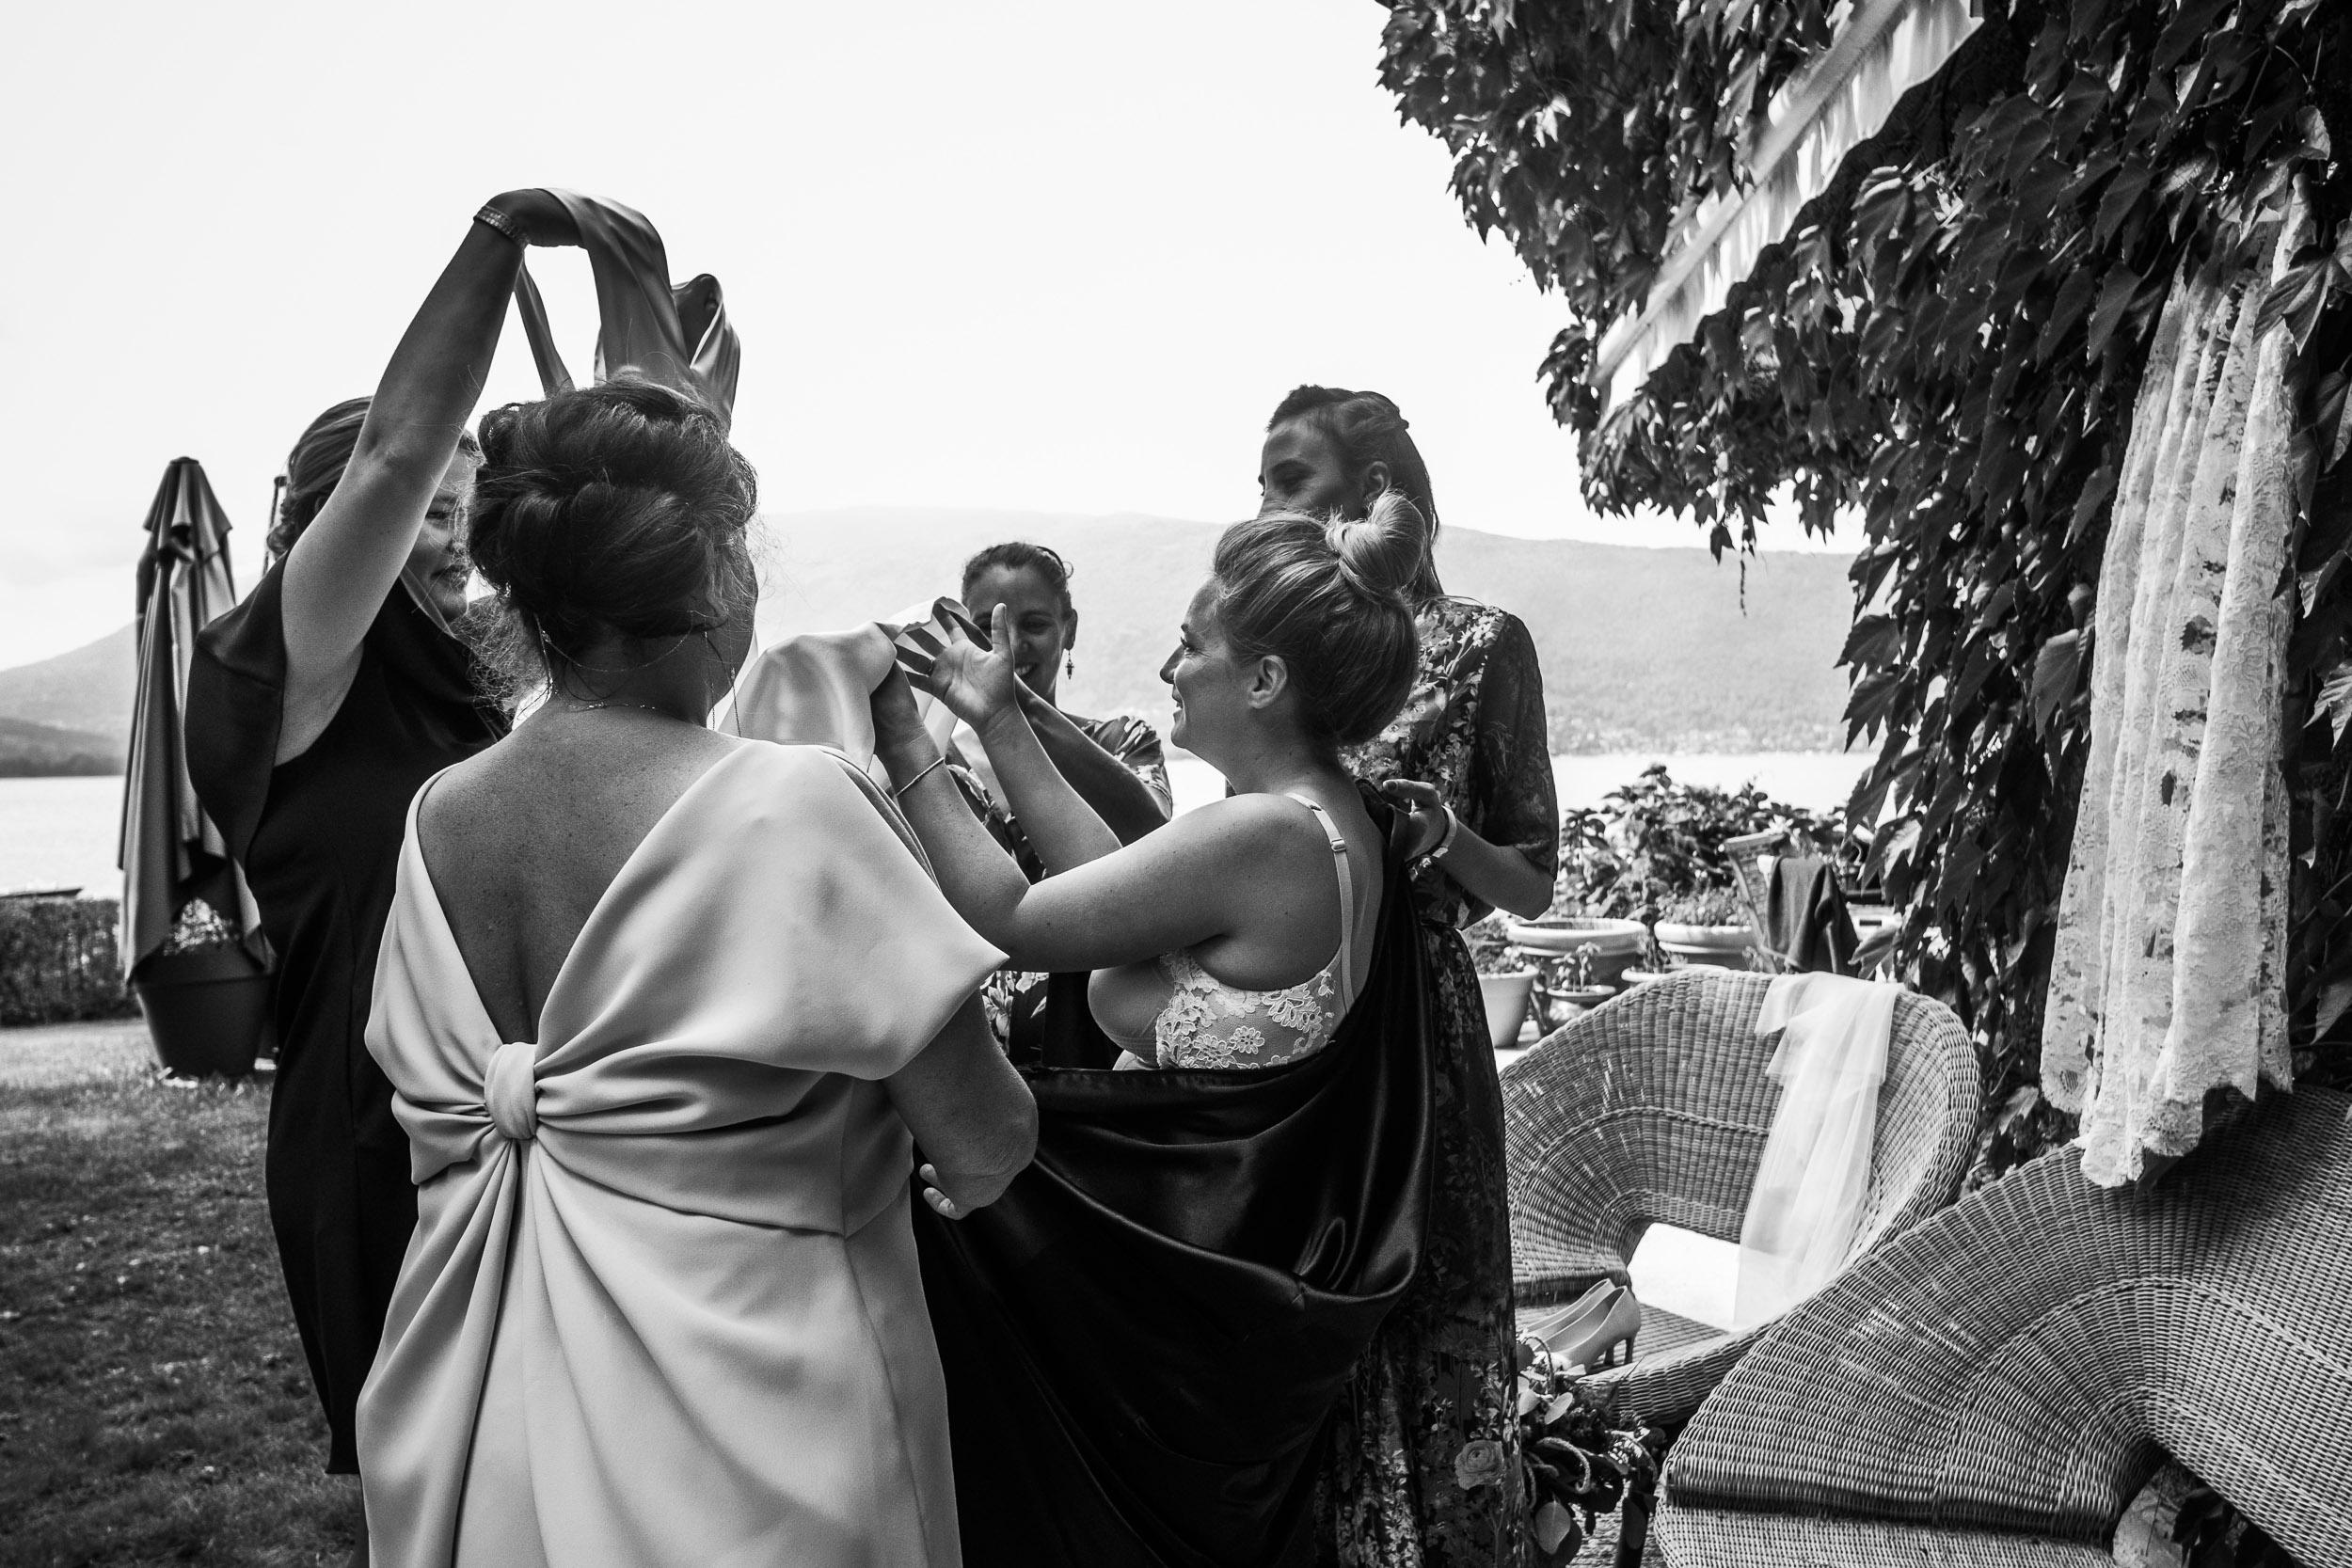 gerald-mattel-photographe-mariage-annecy-verrier-menthon-1.jpg